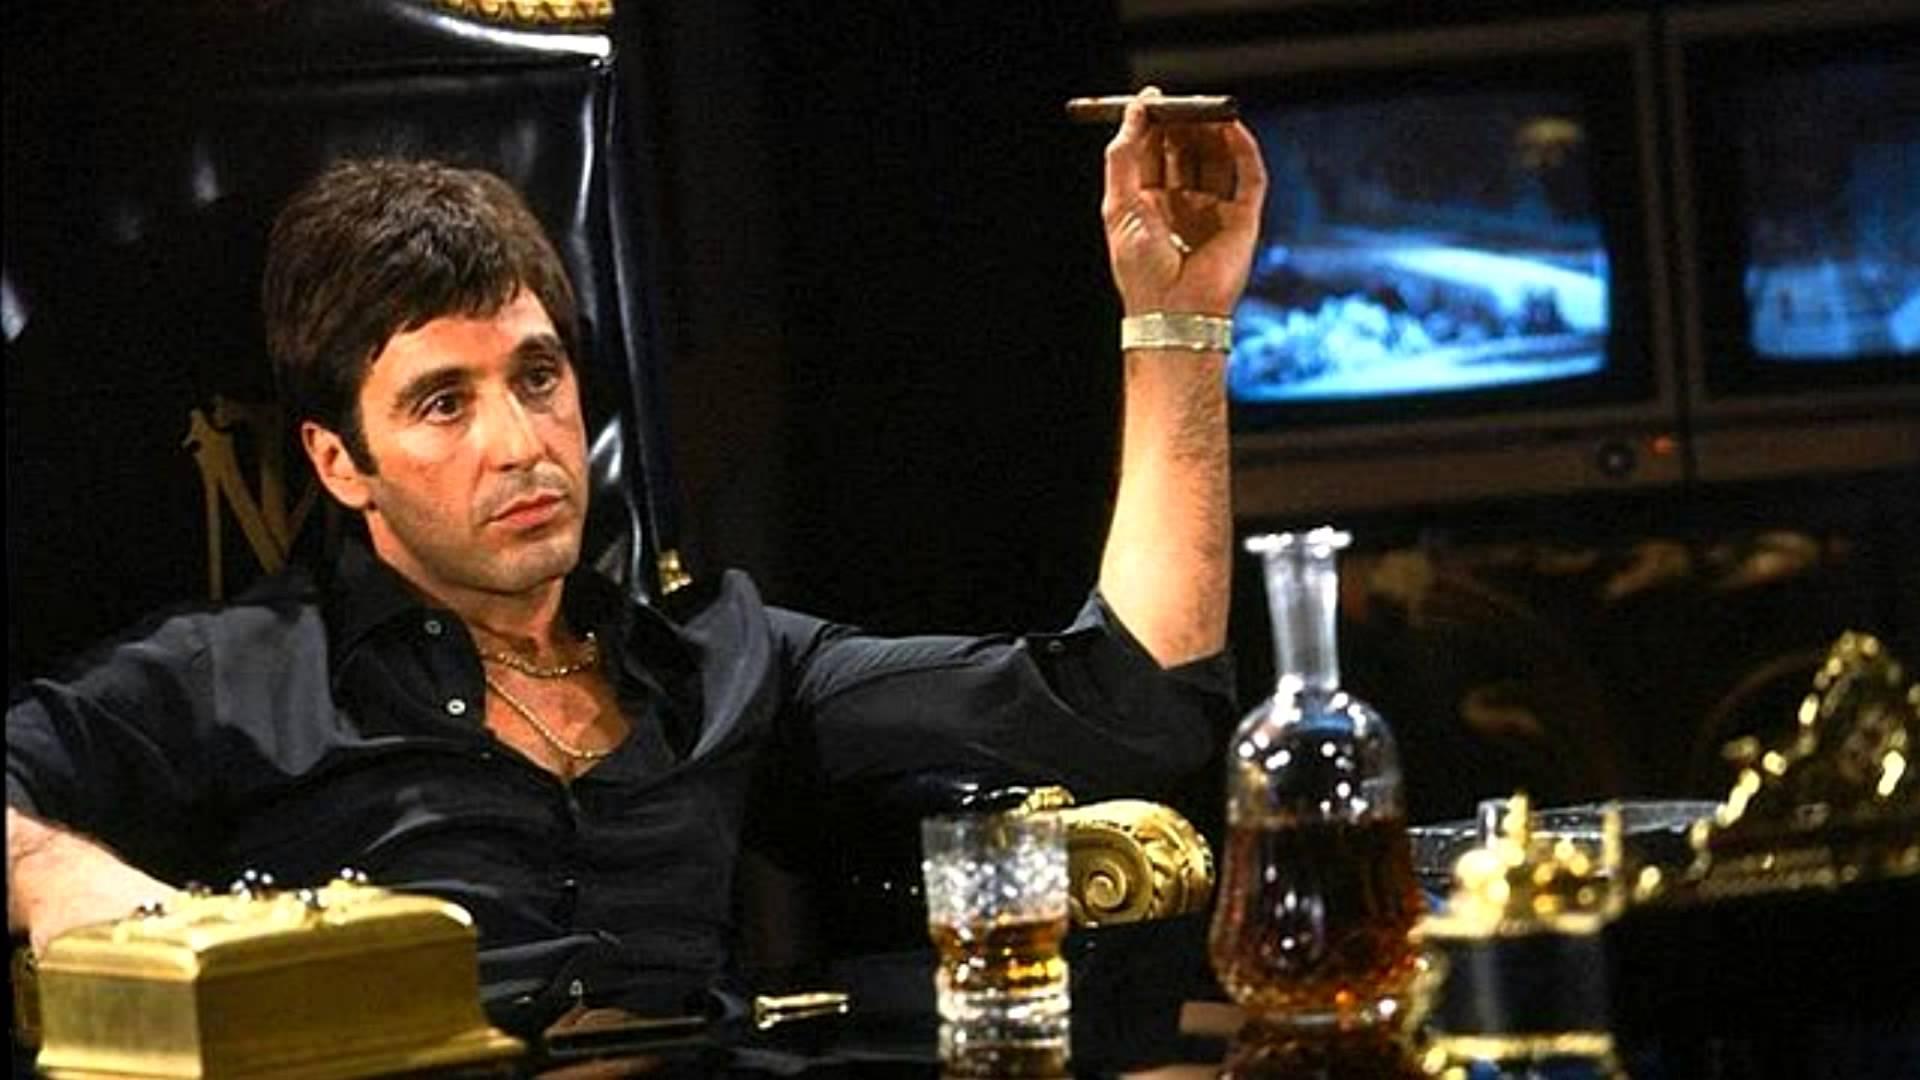 Scarface Al Pacino Hd 1493501 Hd Wallpaper